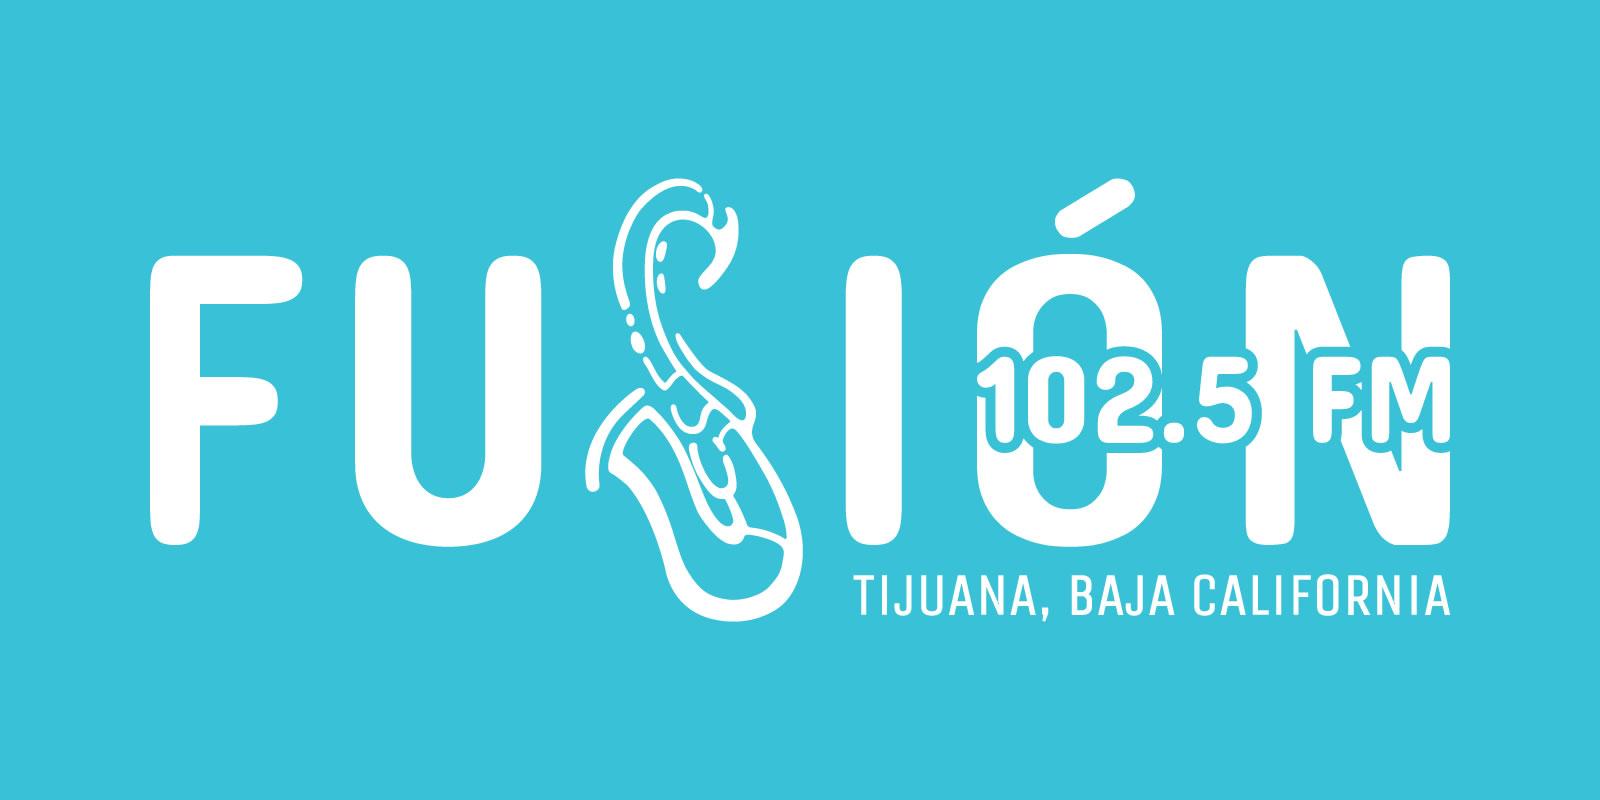 Fusion 102.5 FM, Tijuana, Baja California